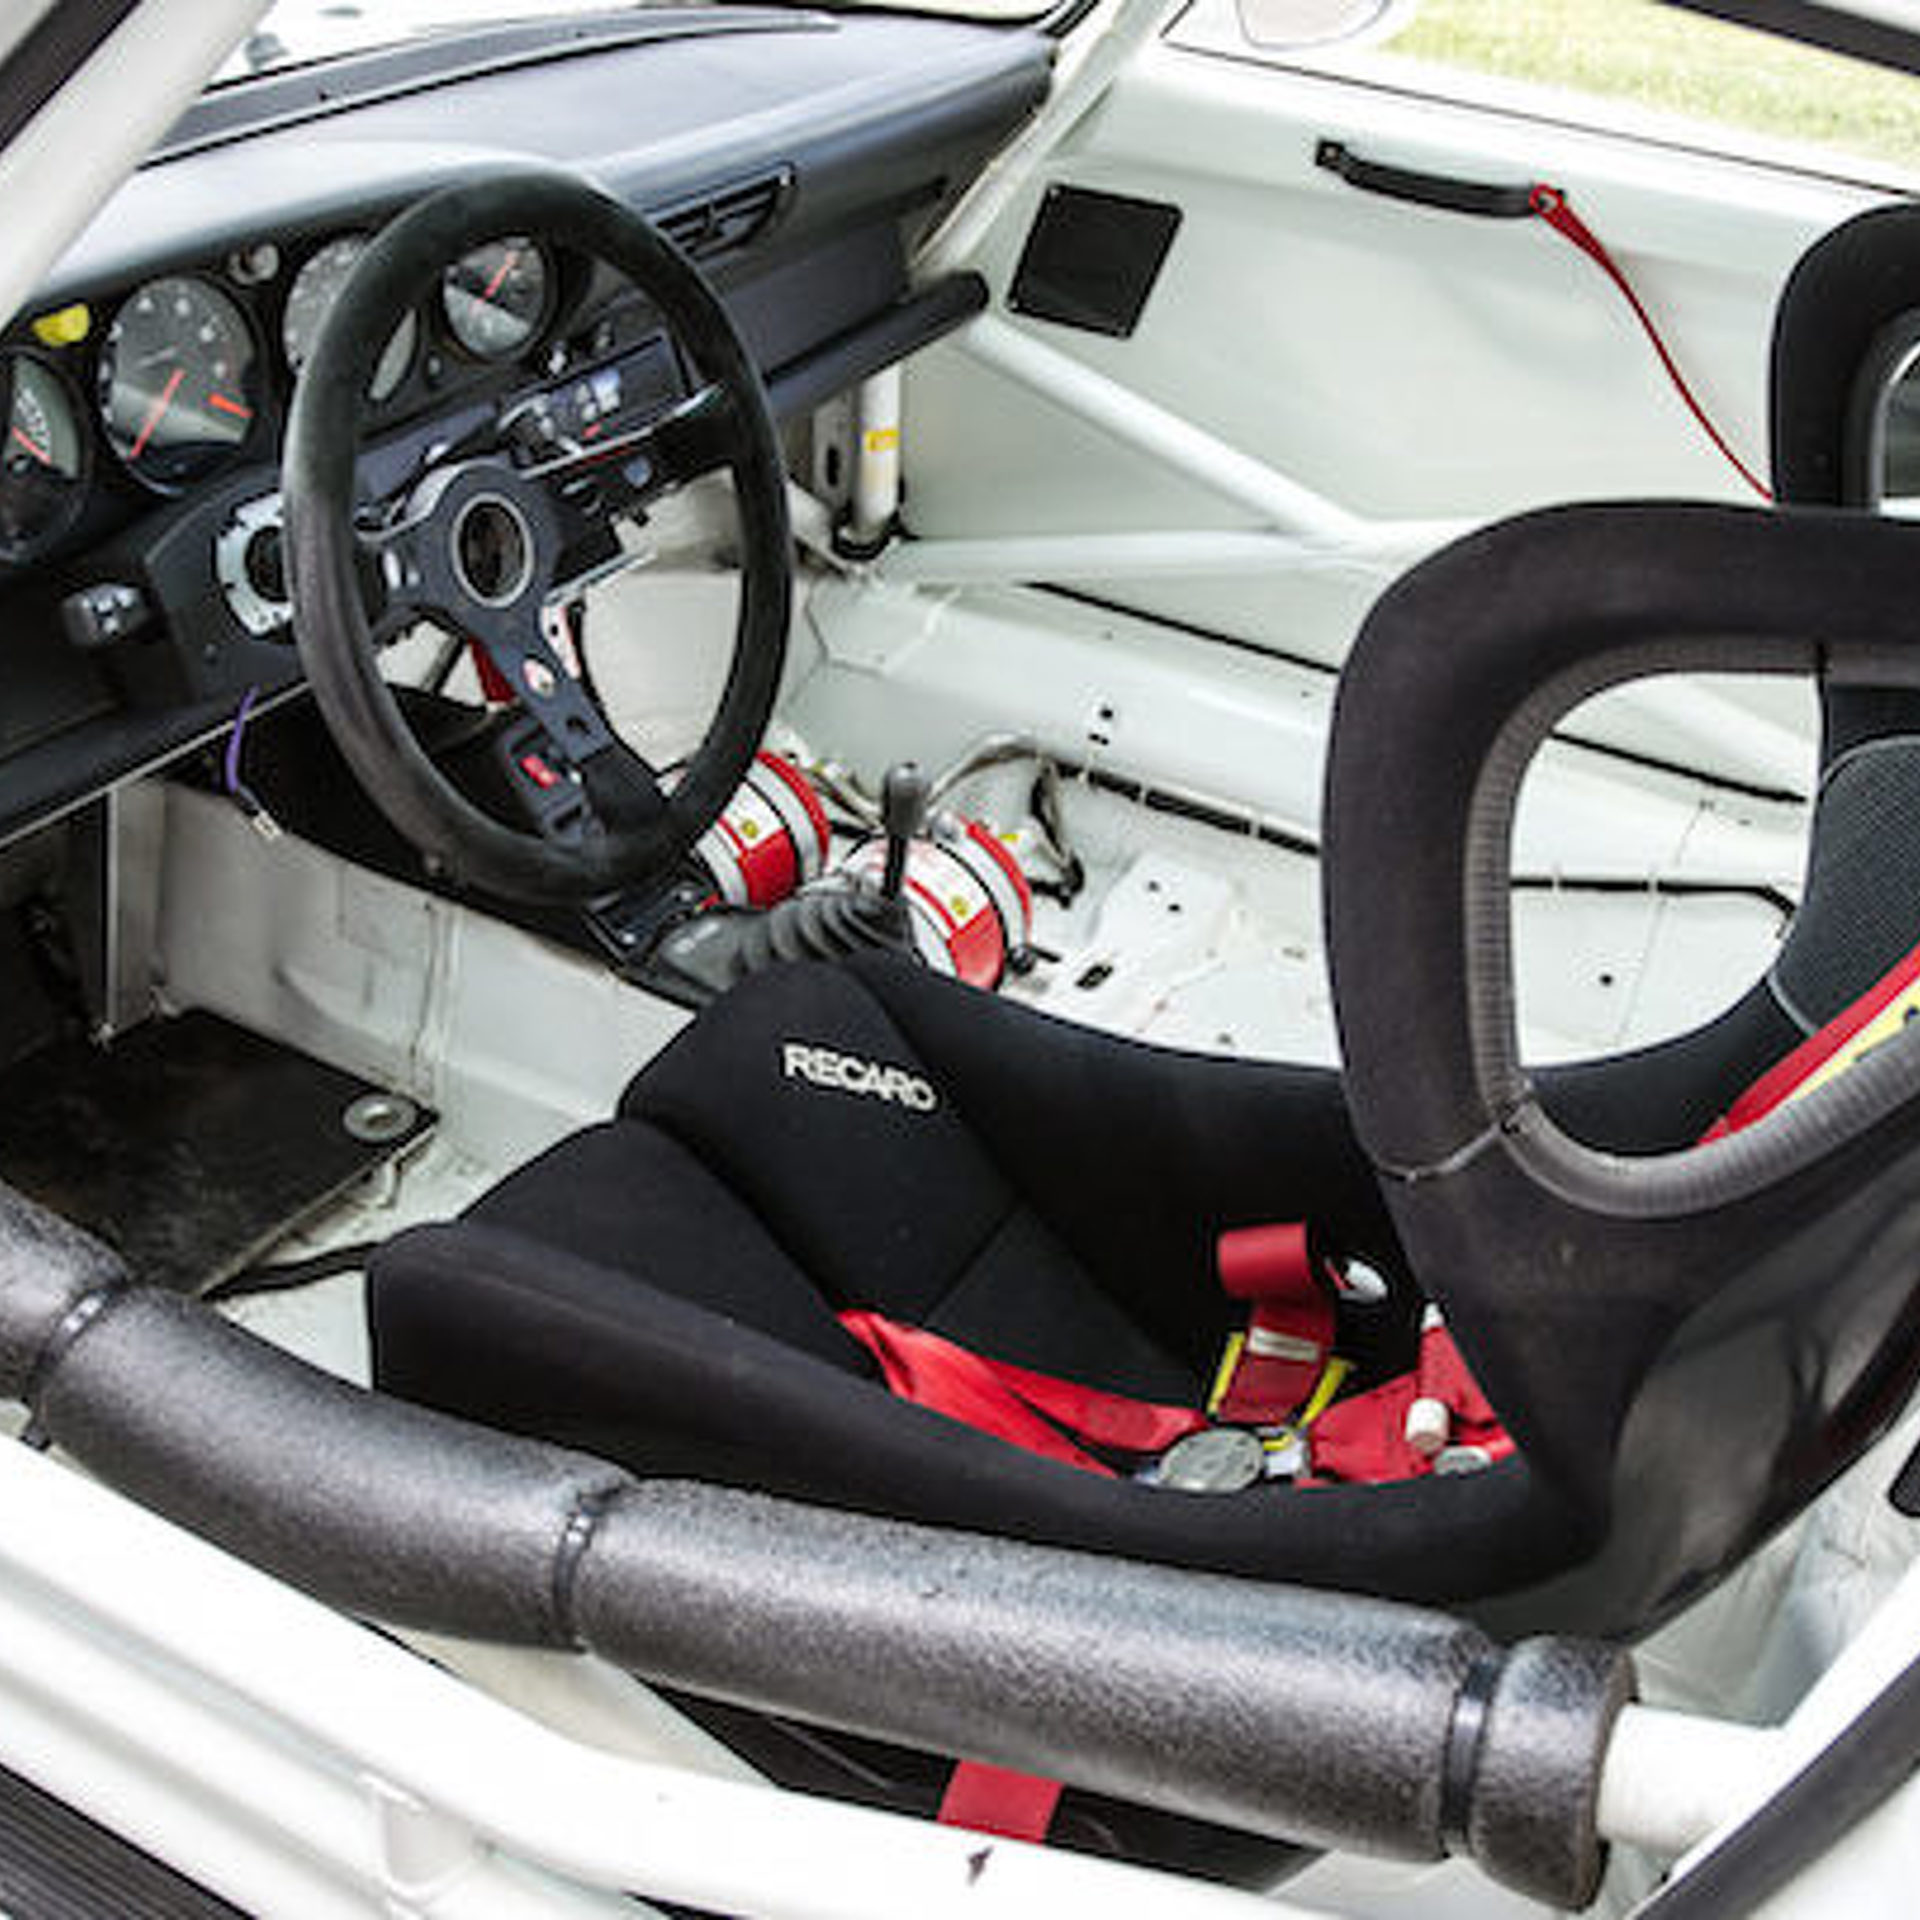 Porsche 911 2 7 Engine Weight: A 1995 Porsche 911 GT2 Evo Is As Raw And Rare As It Gets